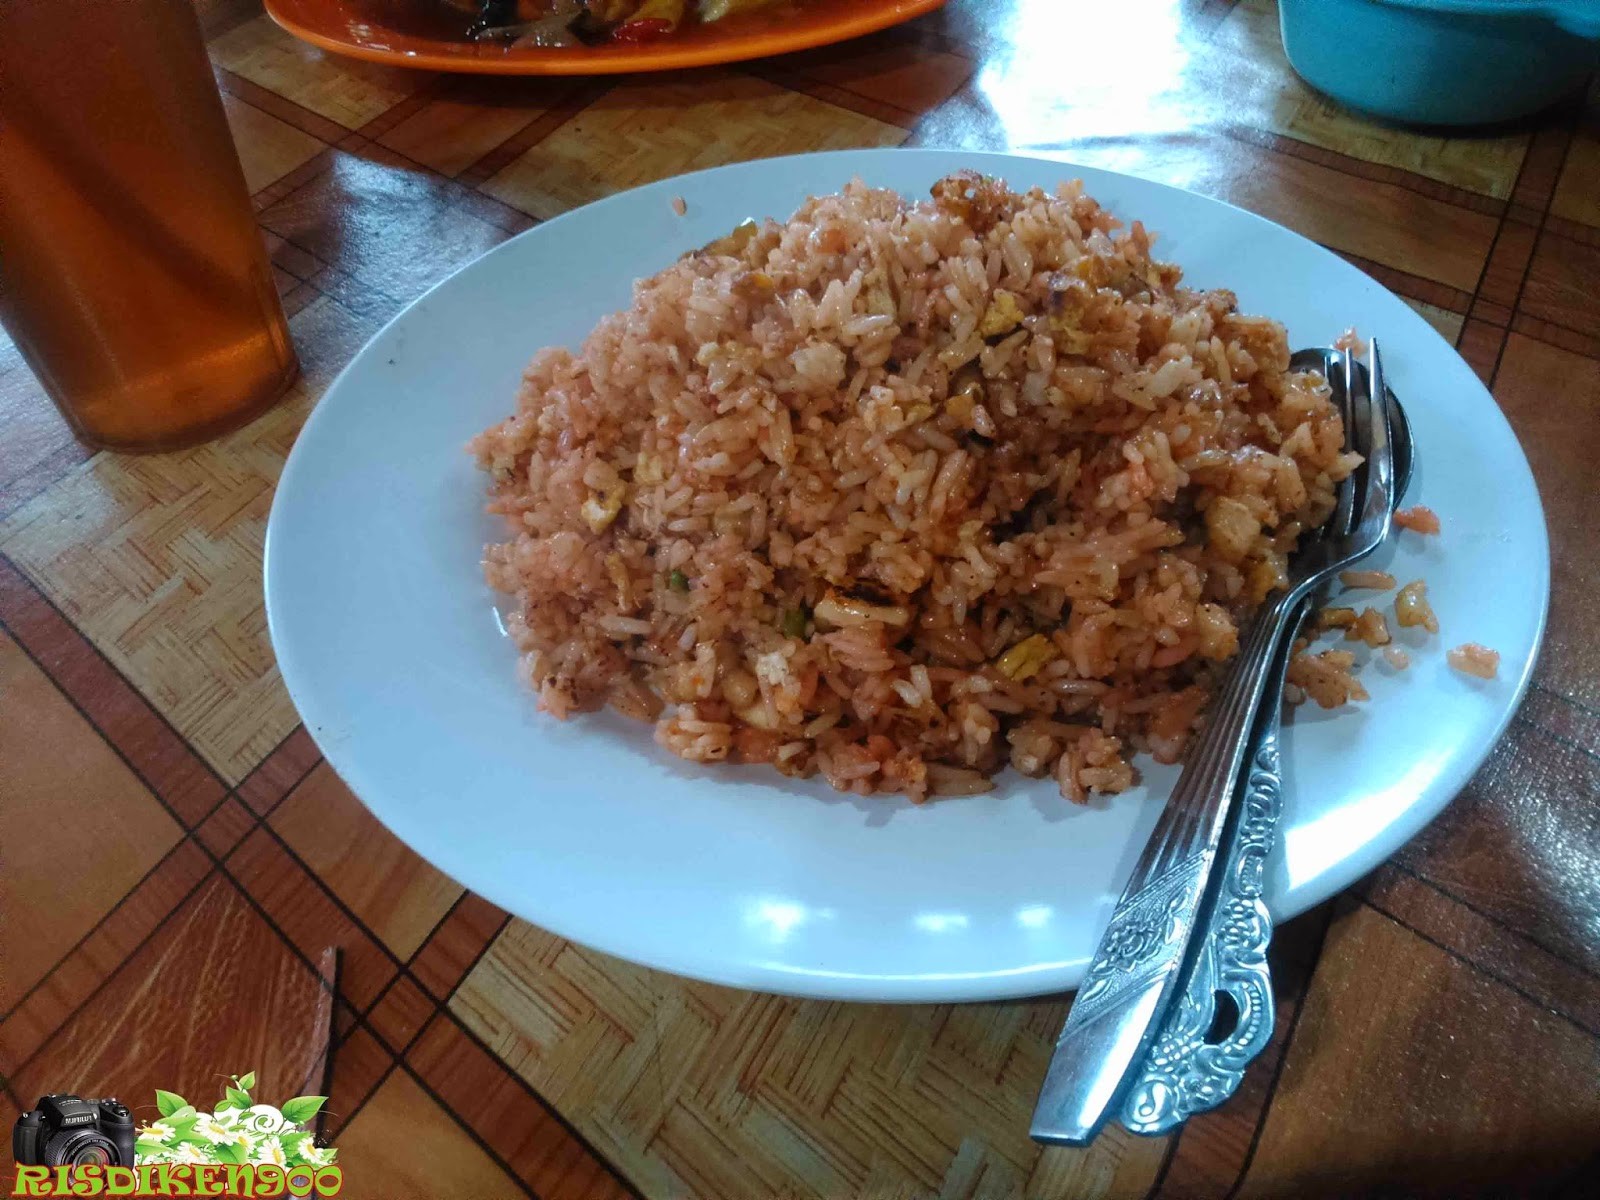 Perjalananku Nasi Goreng Ayam Depot Raja Chinese Food Sidoarjo Pasar